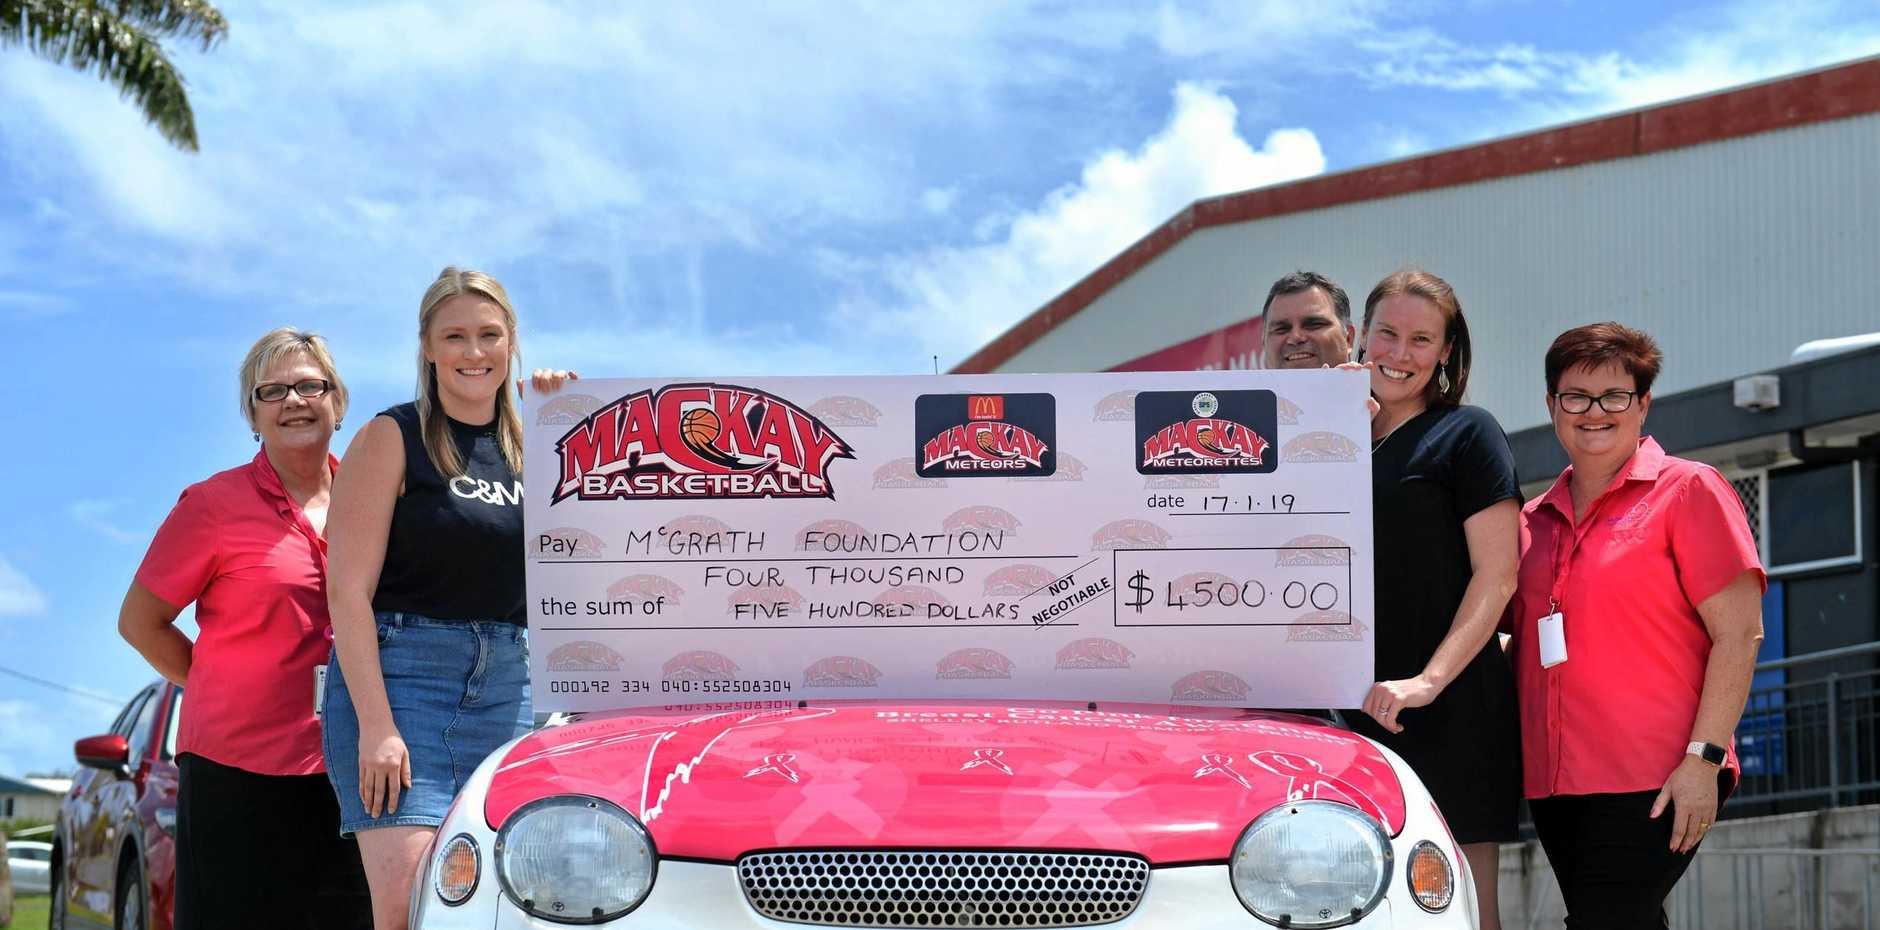 Liz Drefke, Kelsie Rutland, Wade Rebetzke, Courtney Rutland and Sasha MacDonald with a $500 cheque from the money raised for the McGrath Foundation via the 2018 Shelley Rutland Memorial Trophy match.